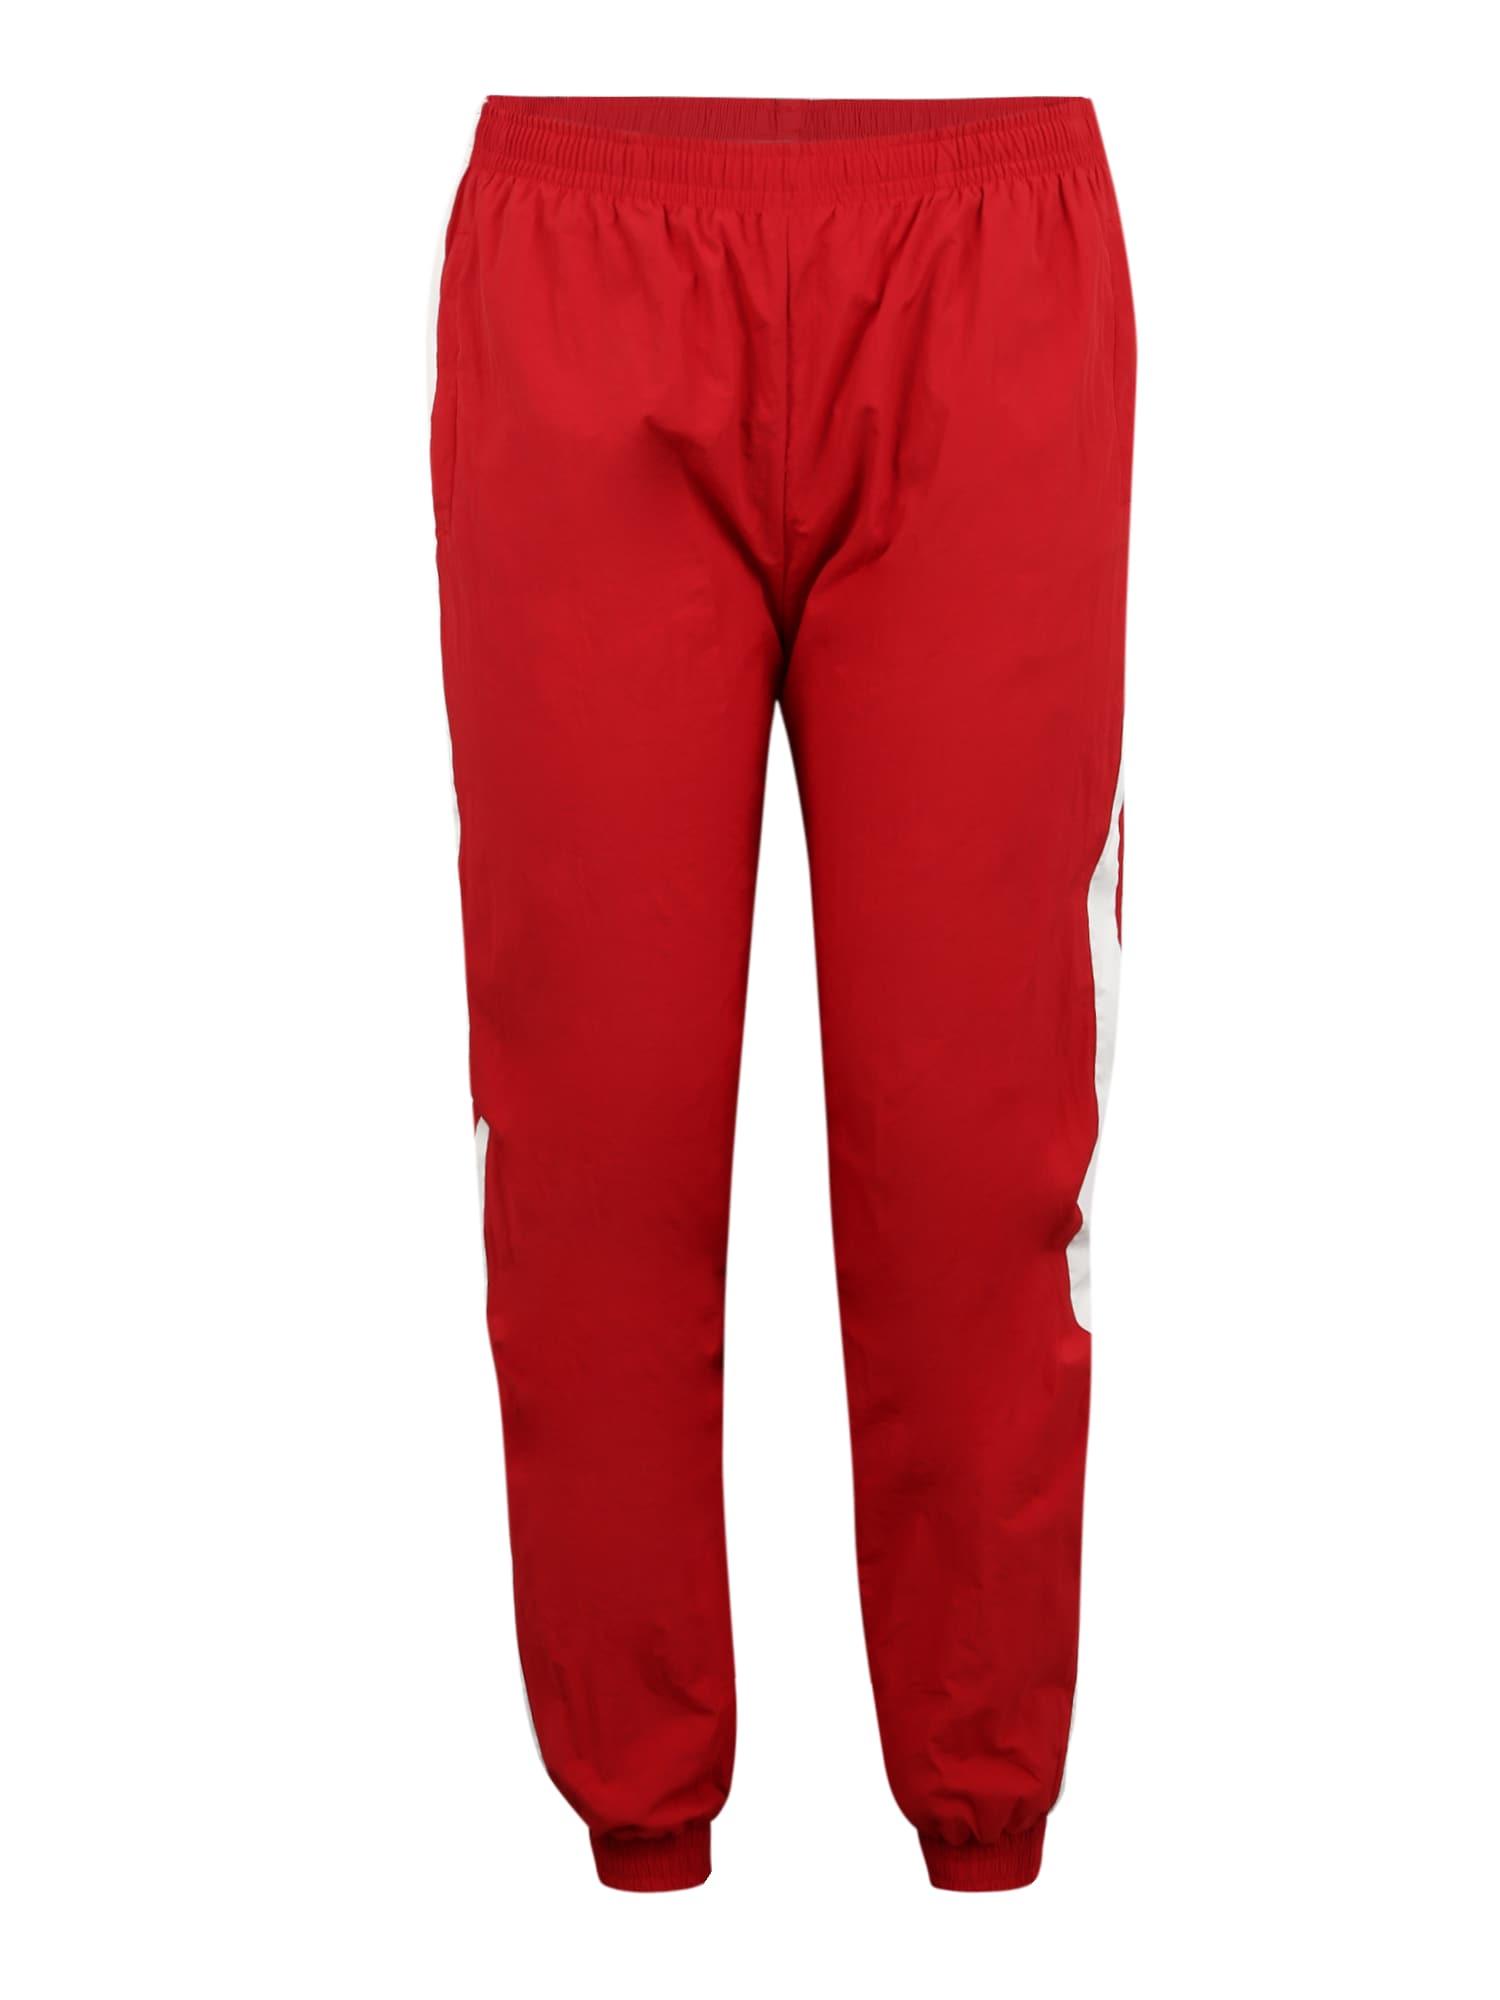 Urban Classics Curvy Kelnės balta / raudona